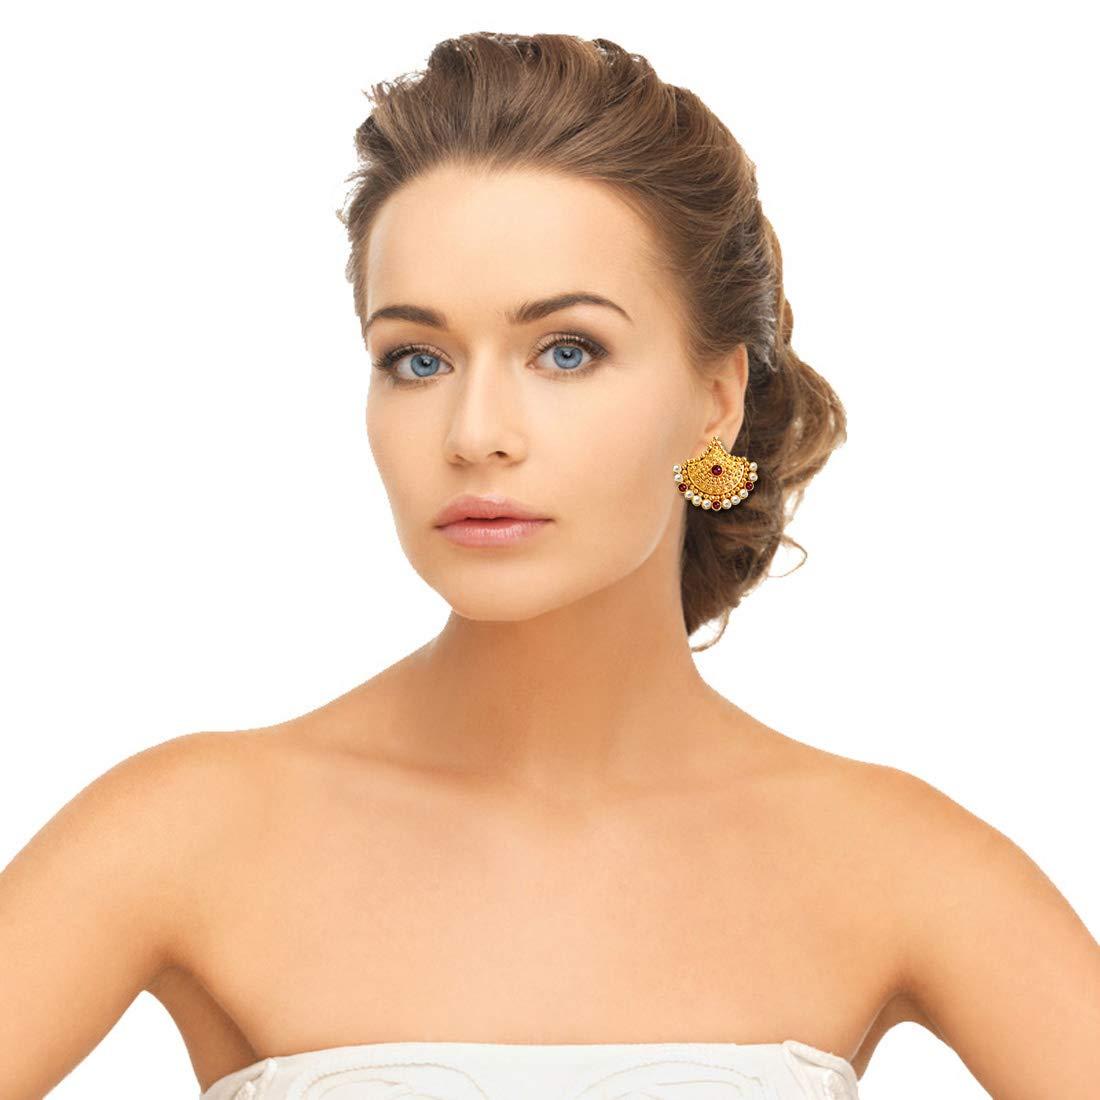 Pretty Lady's Pearl - Real Freshwater Pearl & Red Garnet Beads Geometrical Shaped Earring for Women (SE59)